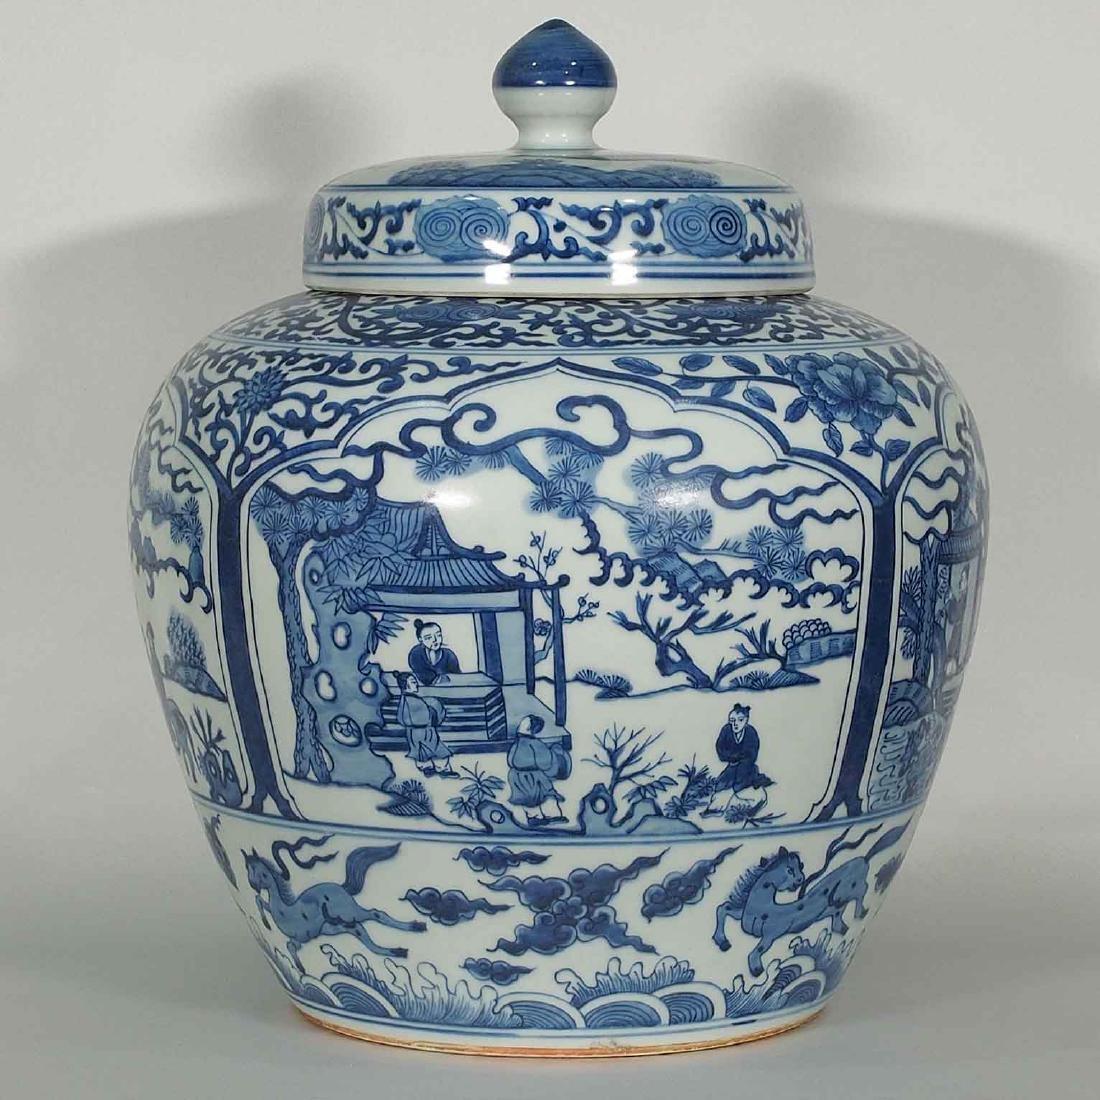 Large Lidded Jar with Narrative Scenes, Jiajing Mark,